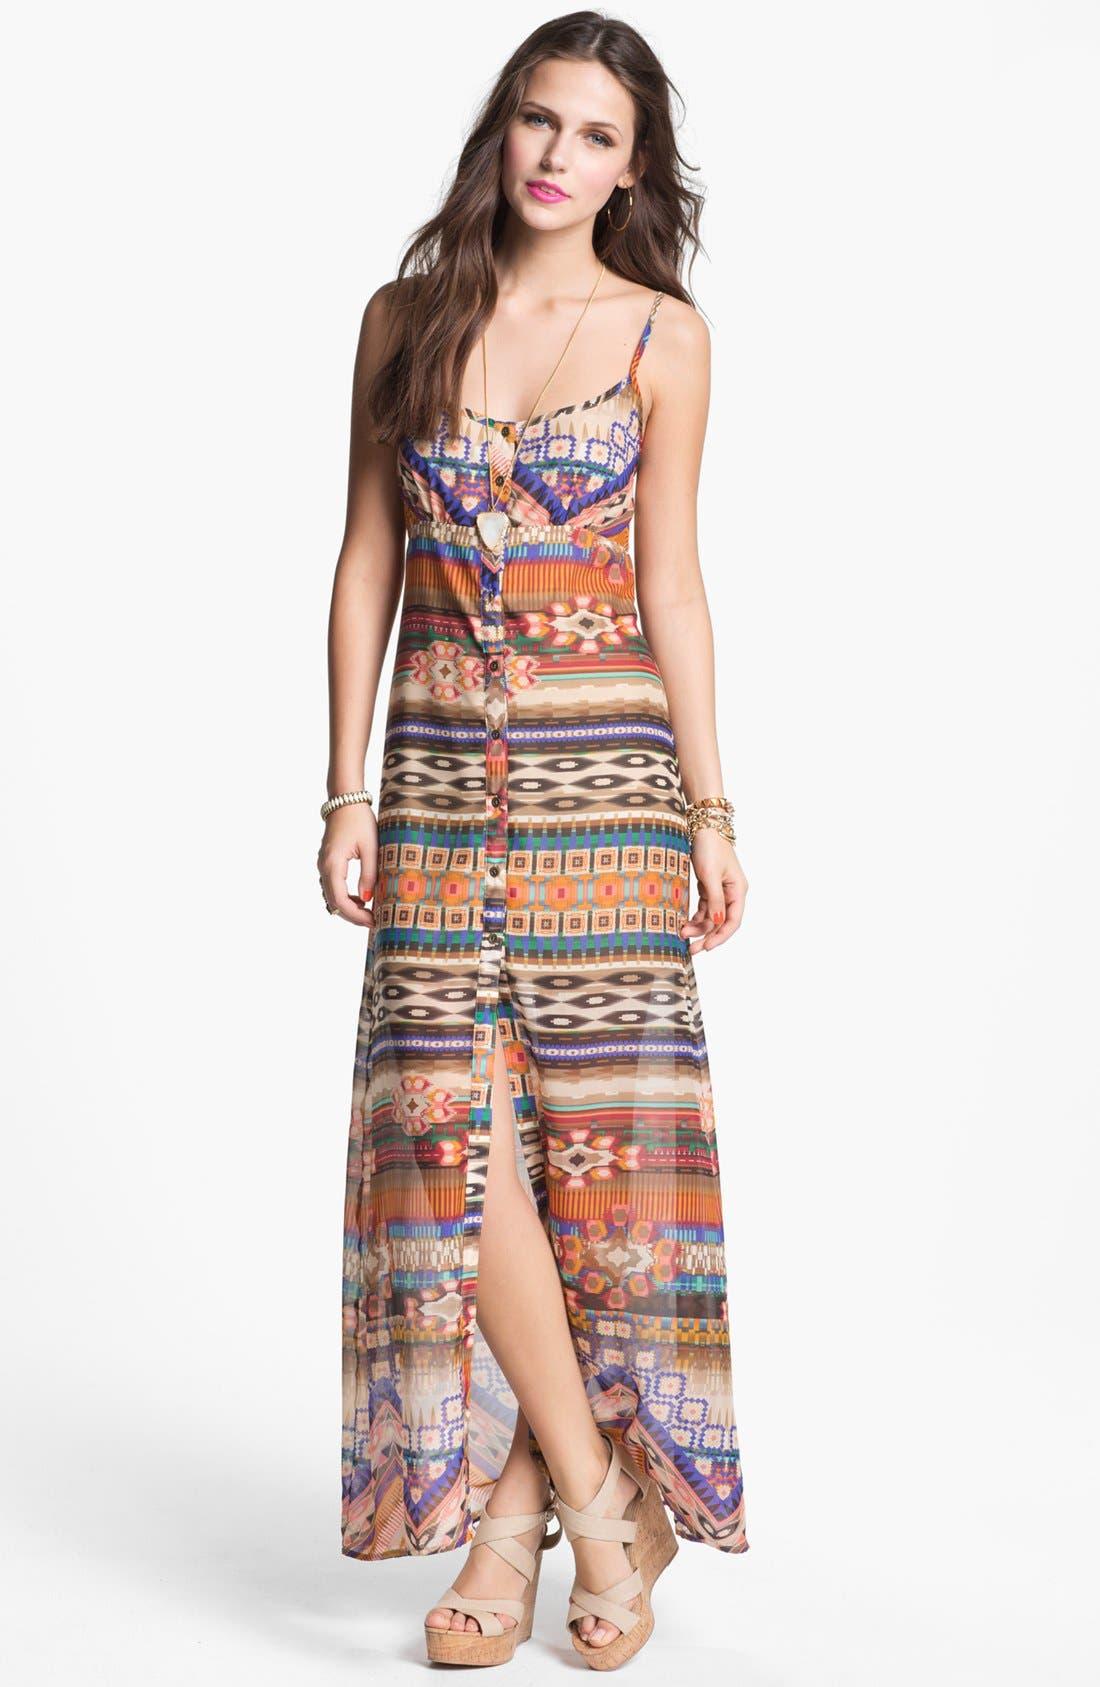 Alternate Image 1 Selected - Mimi Chica Back Cutout Print Maxi Dress (Juniors)